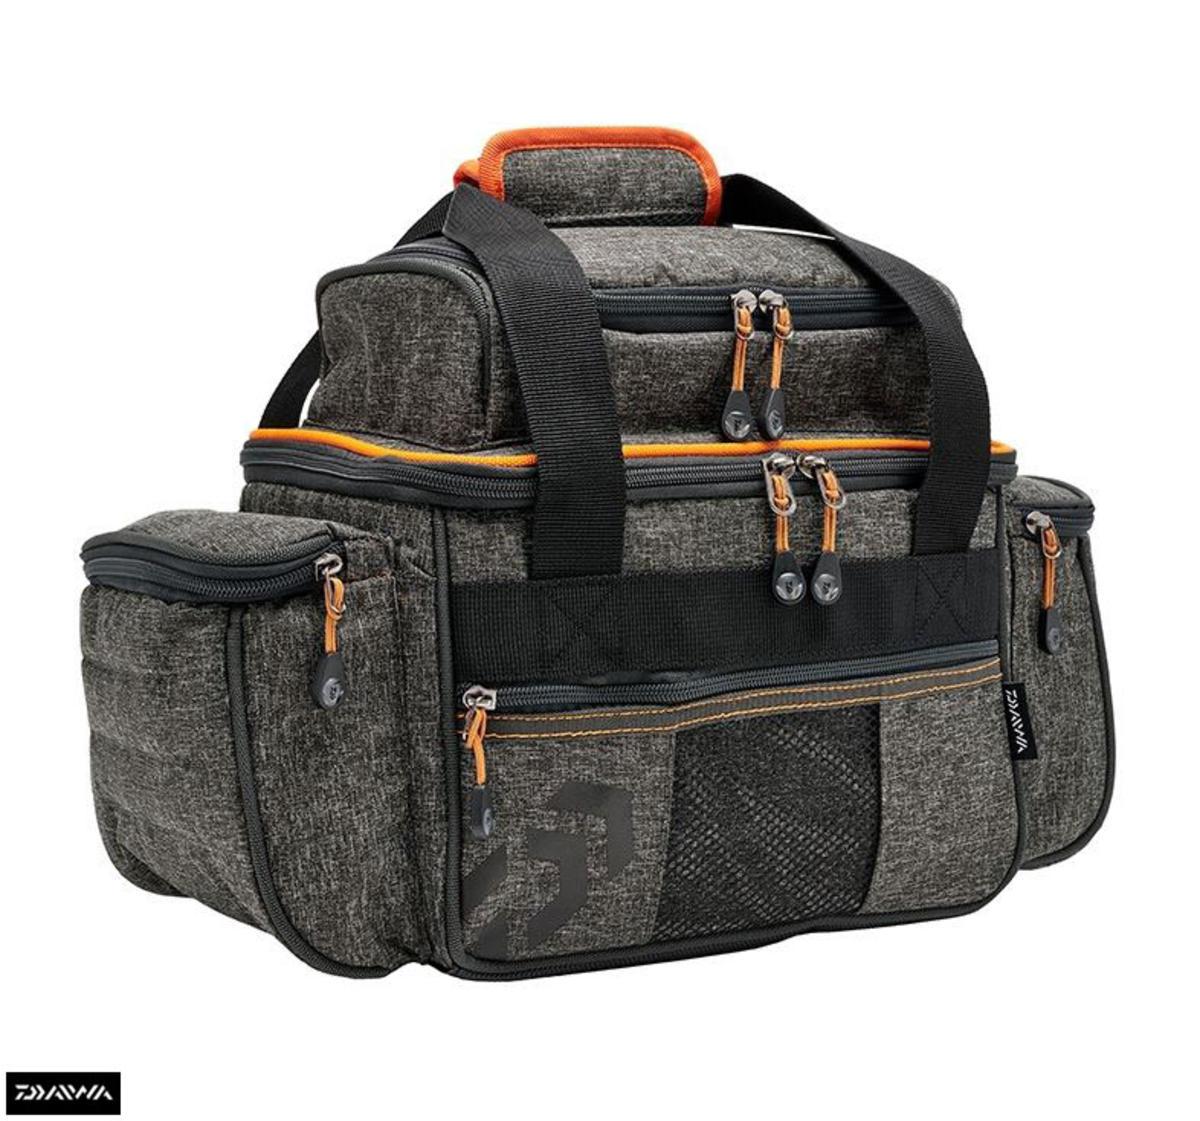 New Daiwa Accessory Fishing Bag - Medium - DAB-M